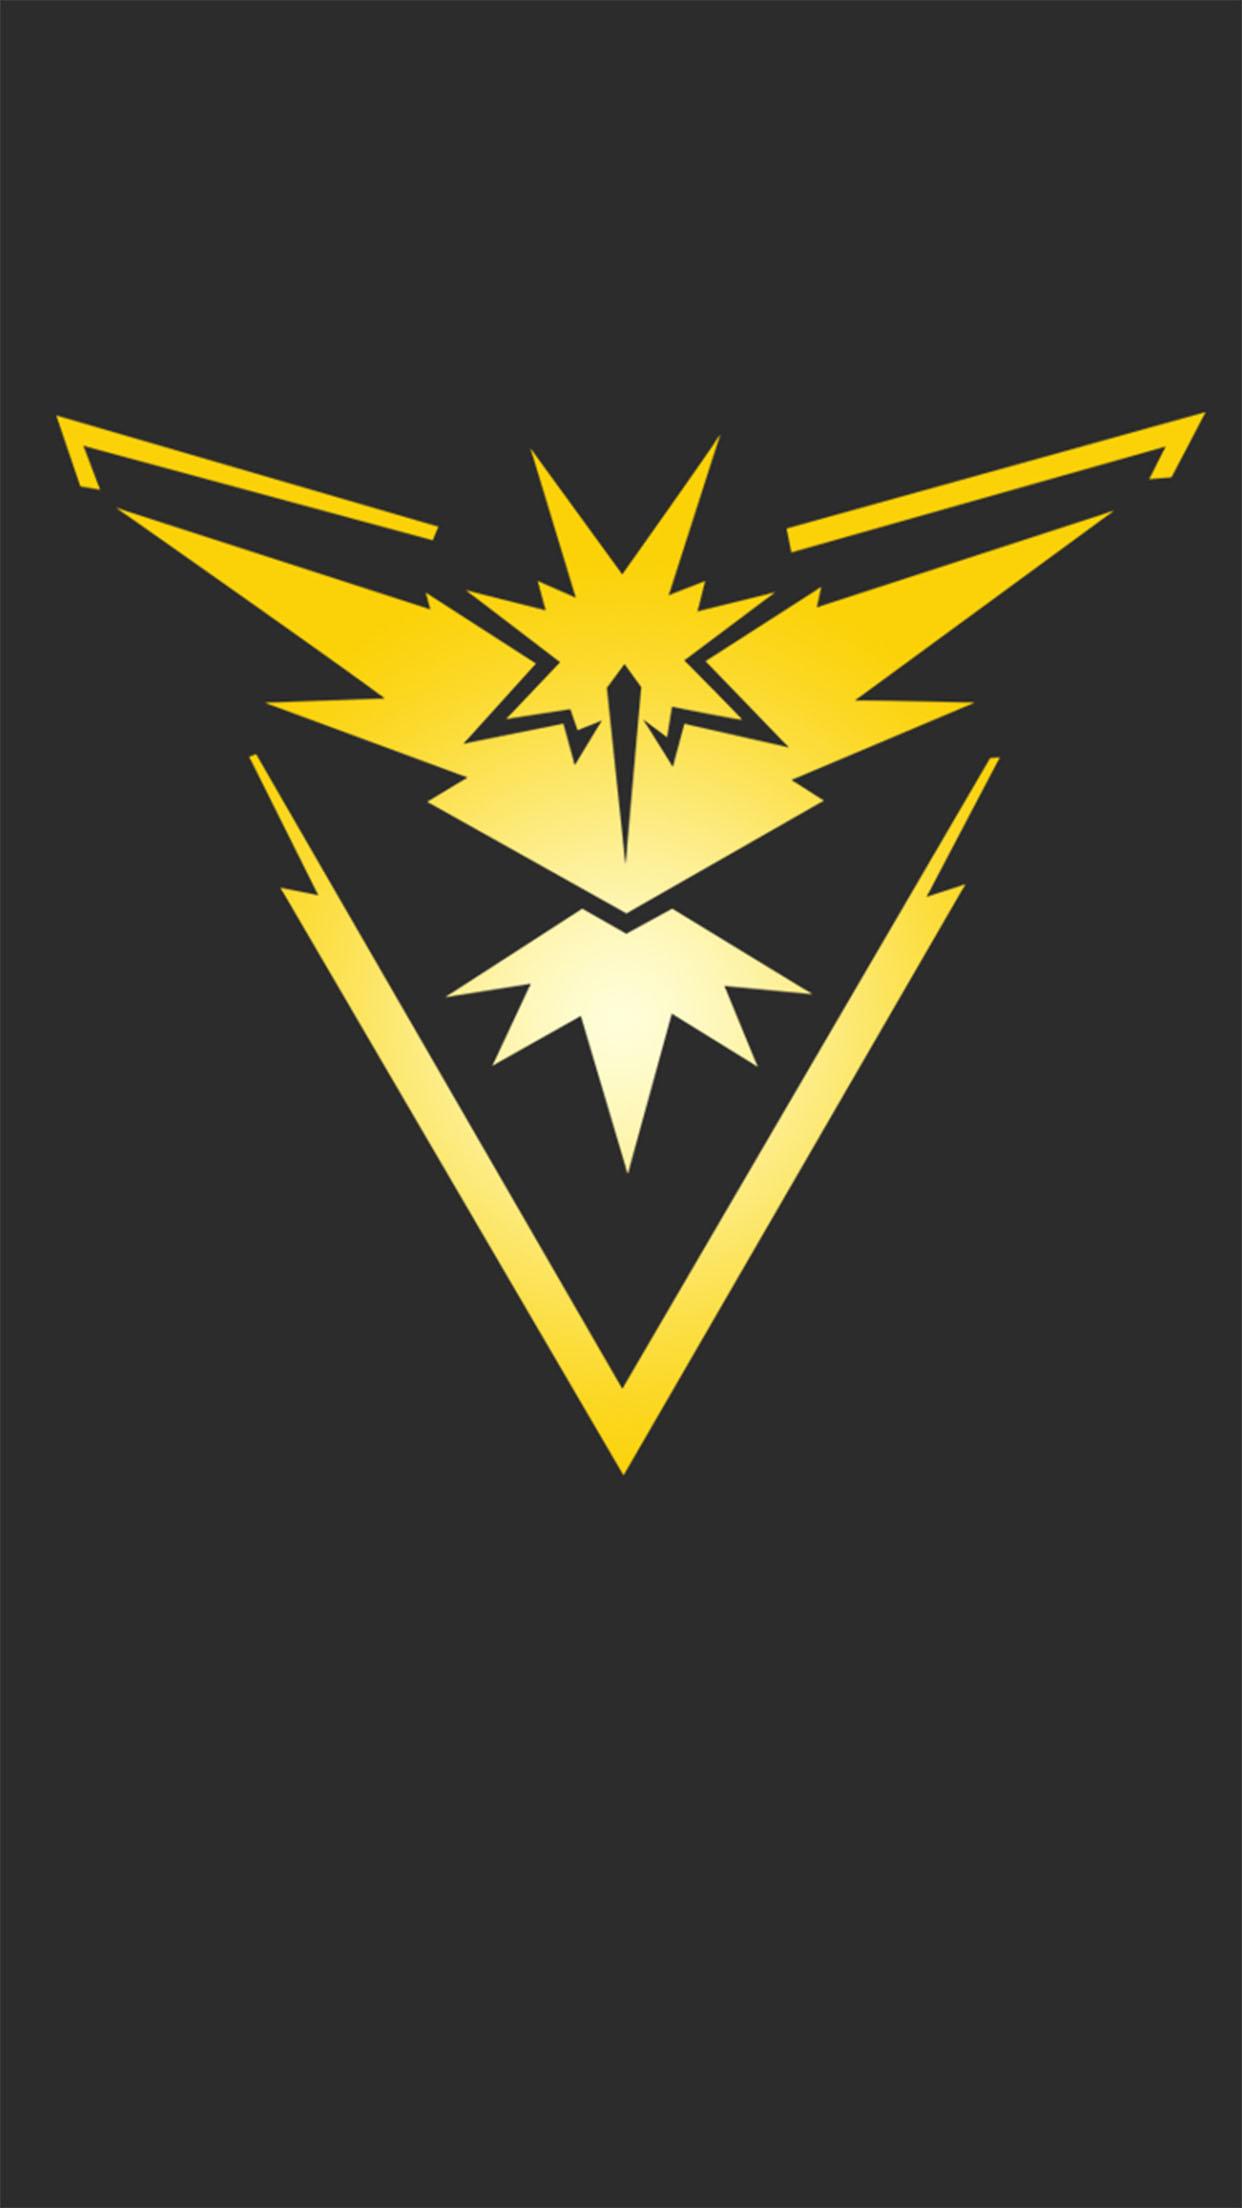 Pokémon GO Logo 1 3Wallpapers iPhone Parallax Pokémon GO logo 1